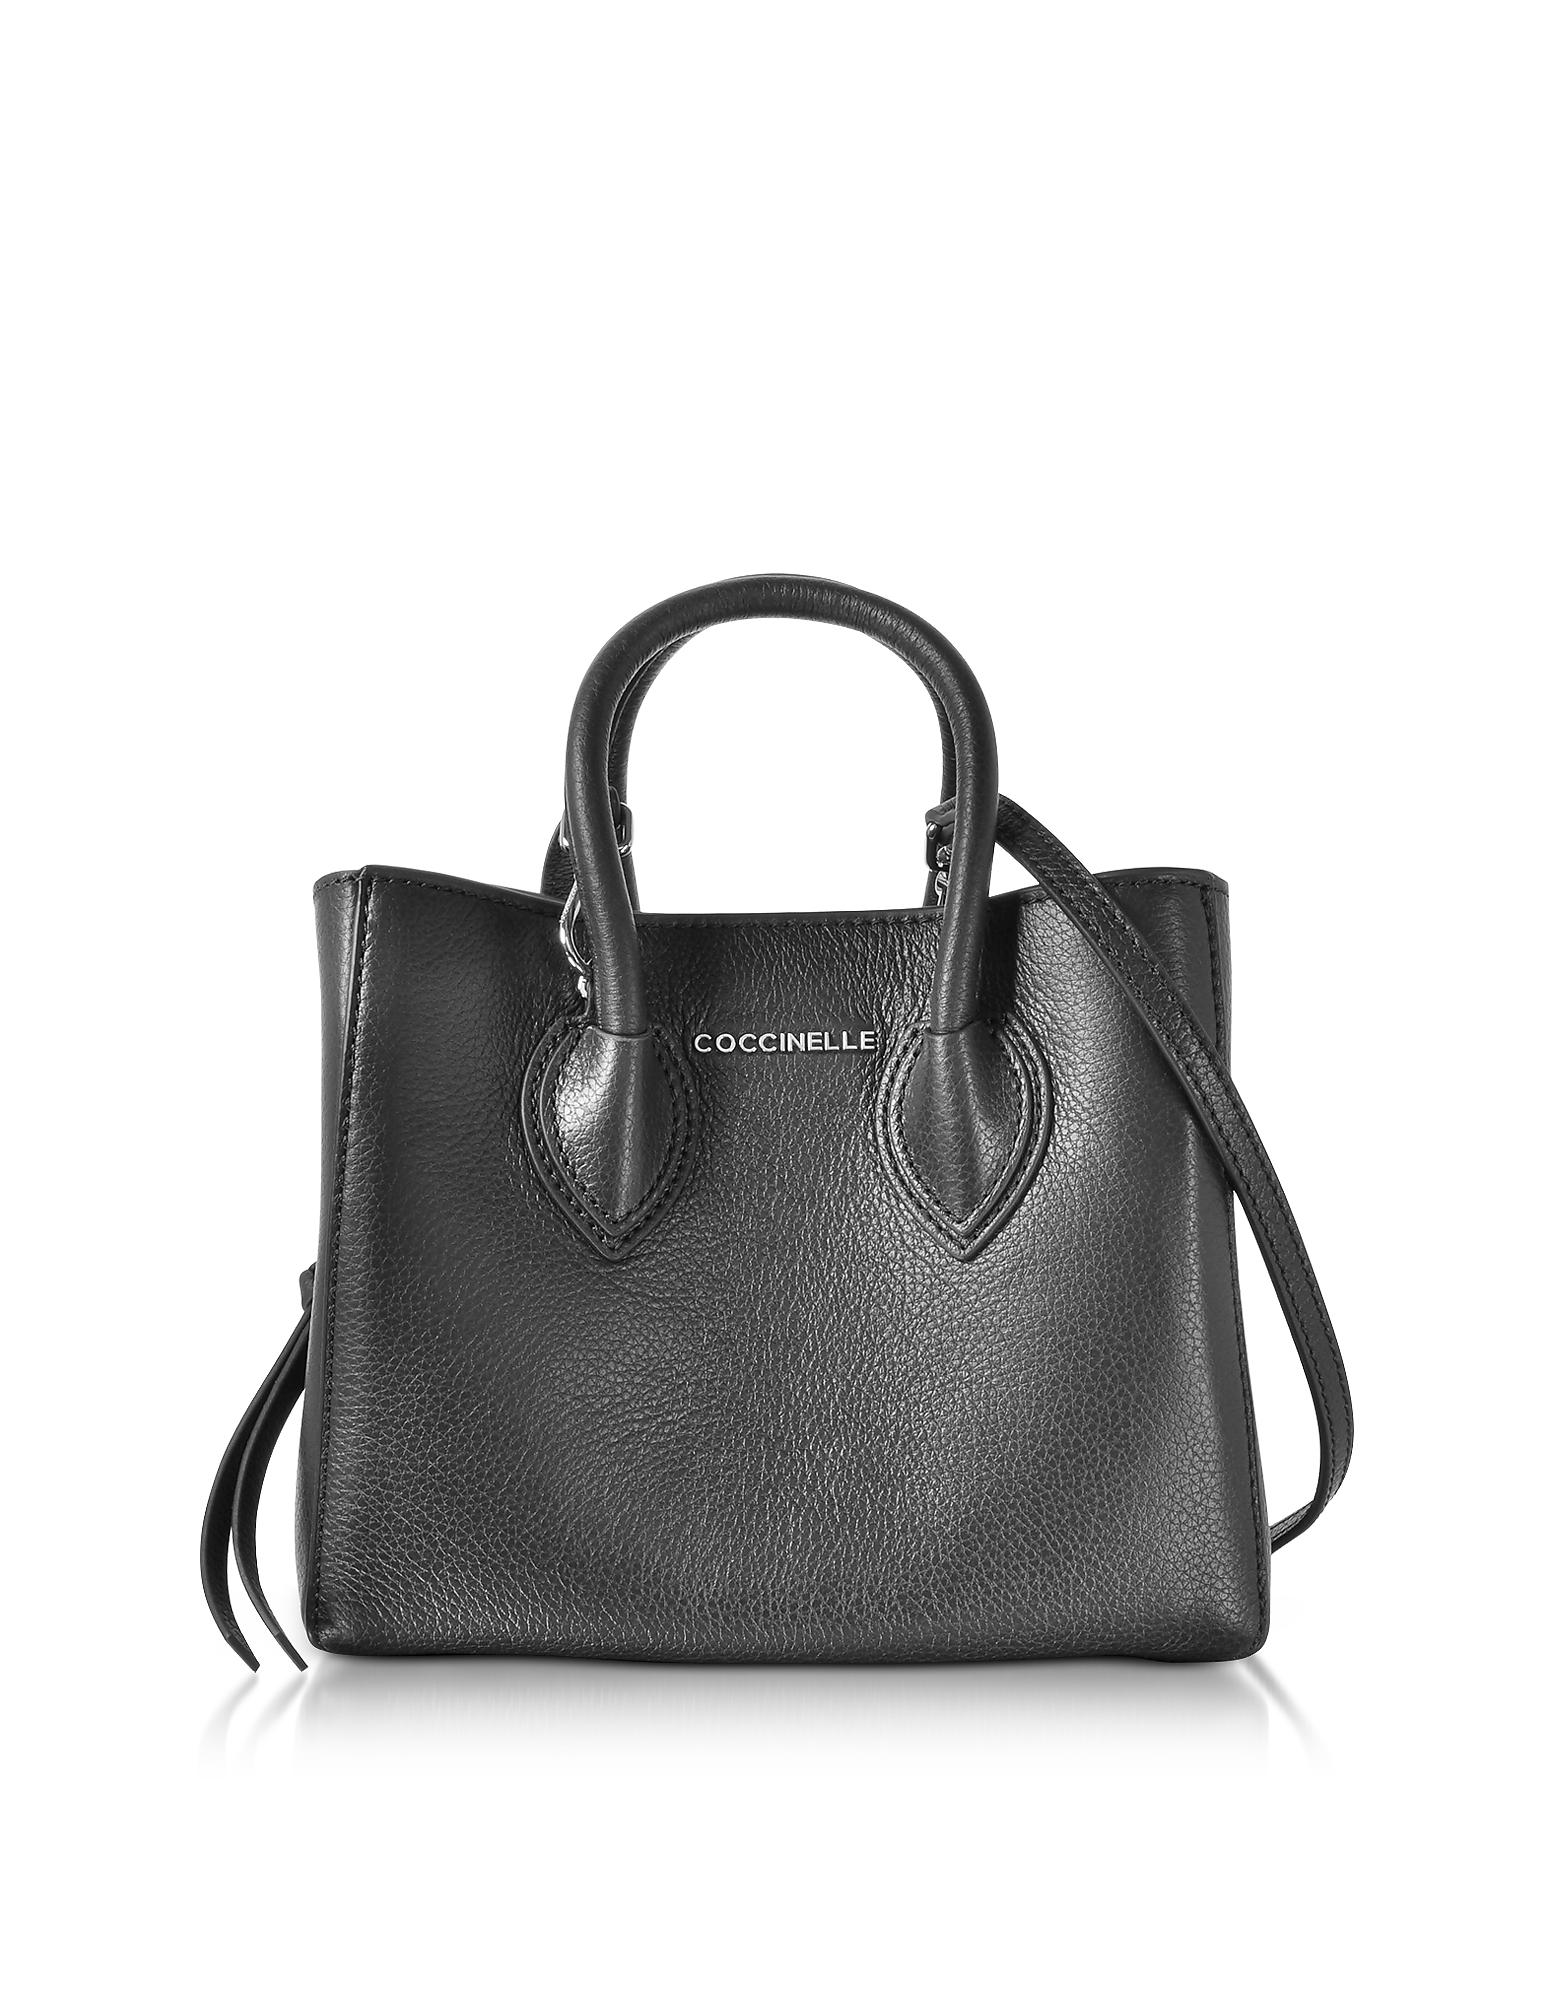 Coccinelle Handbags, Farisa Black Pebbled Leather Mini Tote Bag